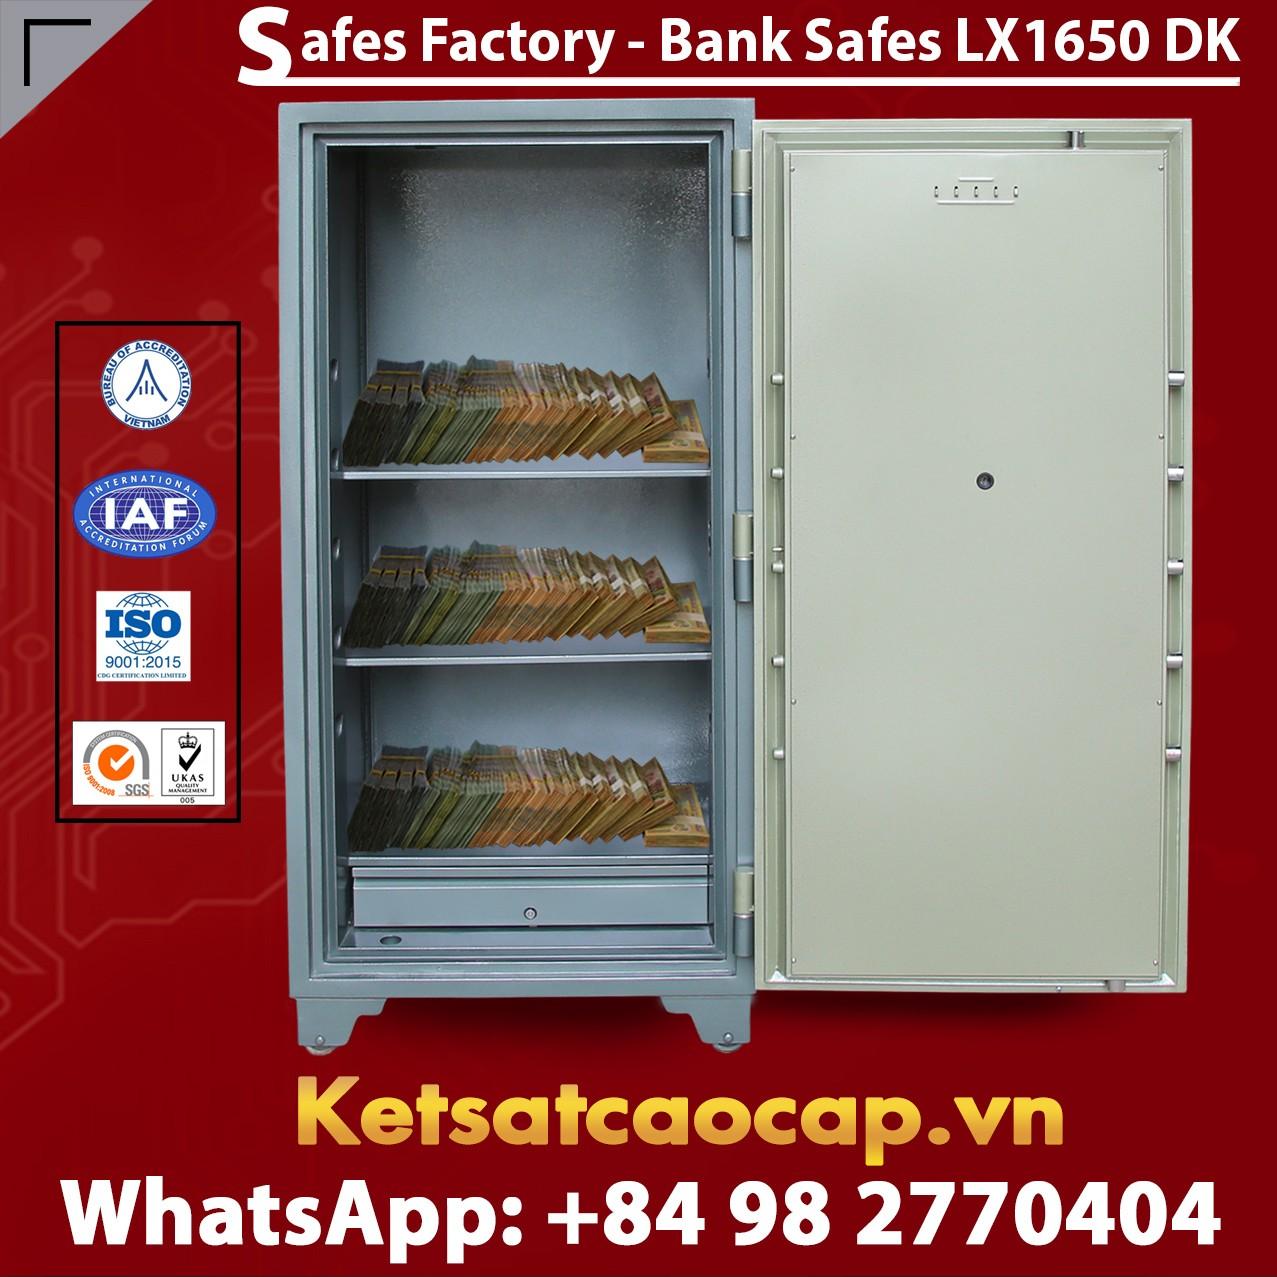 Bank Safes LX1650 DK The Best Bank Safes In the World From BEMC Safe